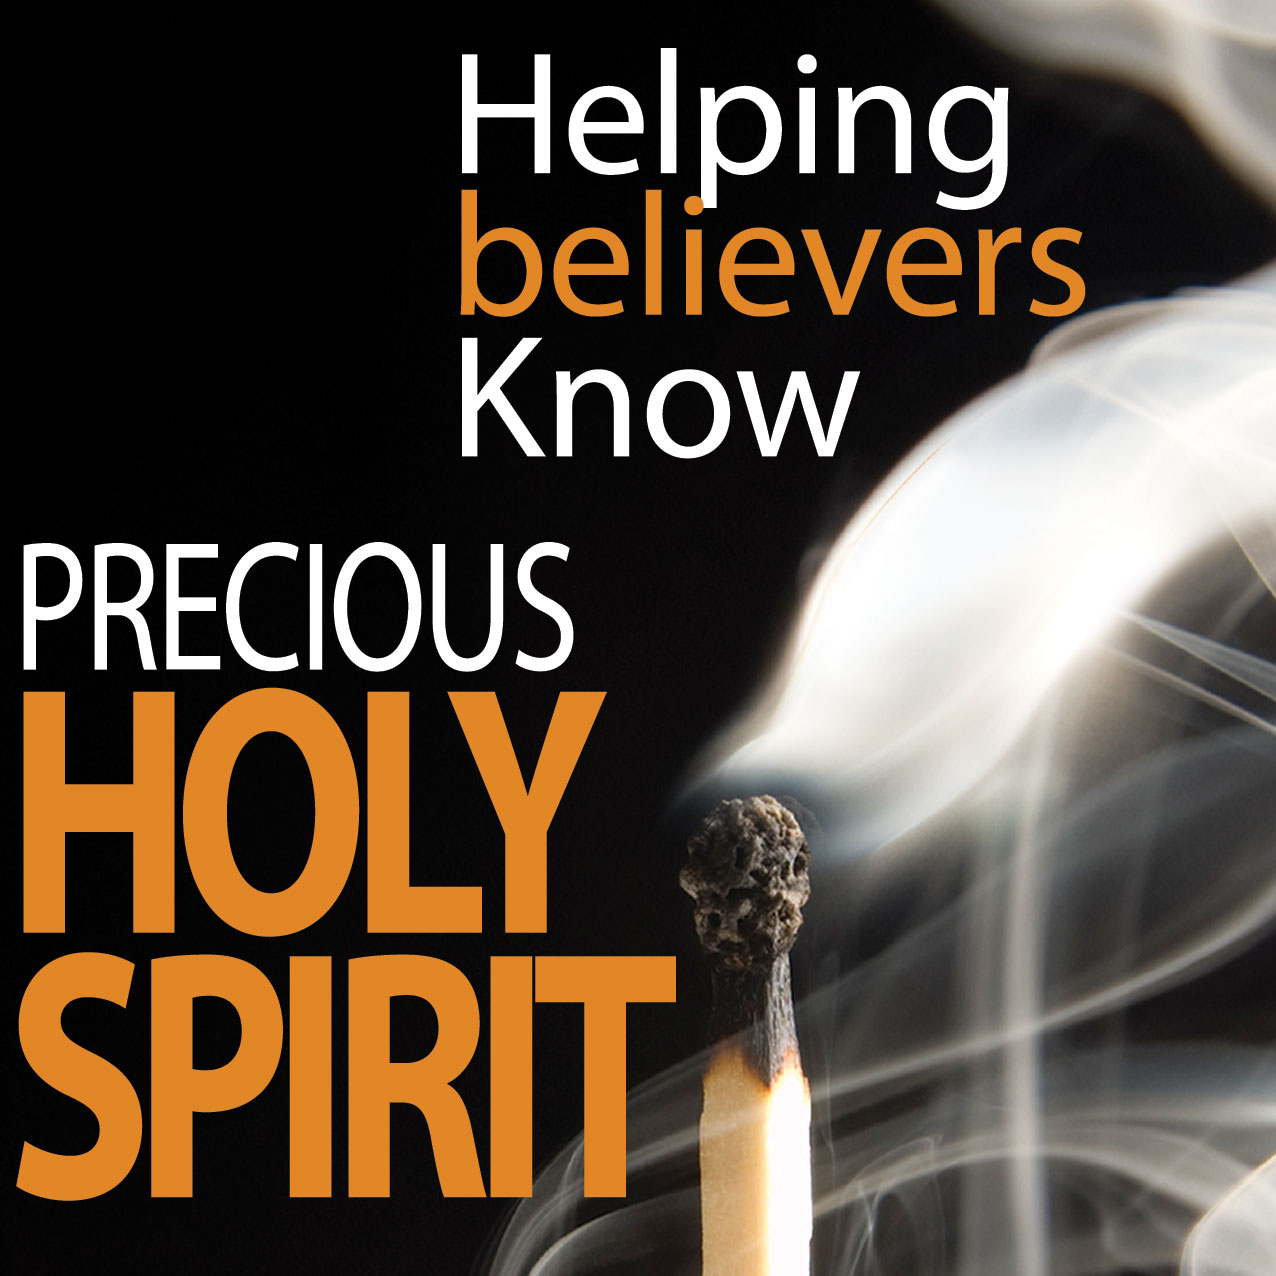 helping believers know Precious Holy Spirit